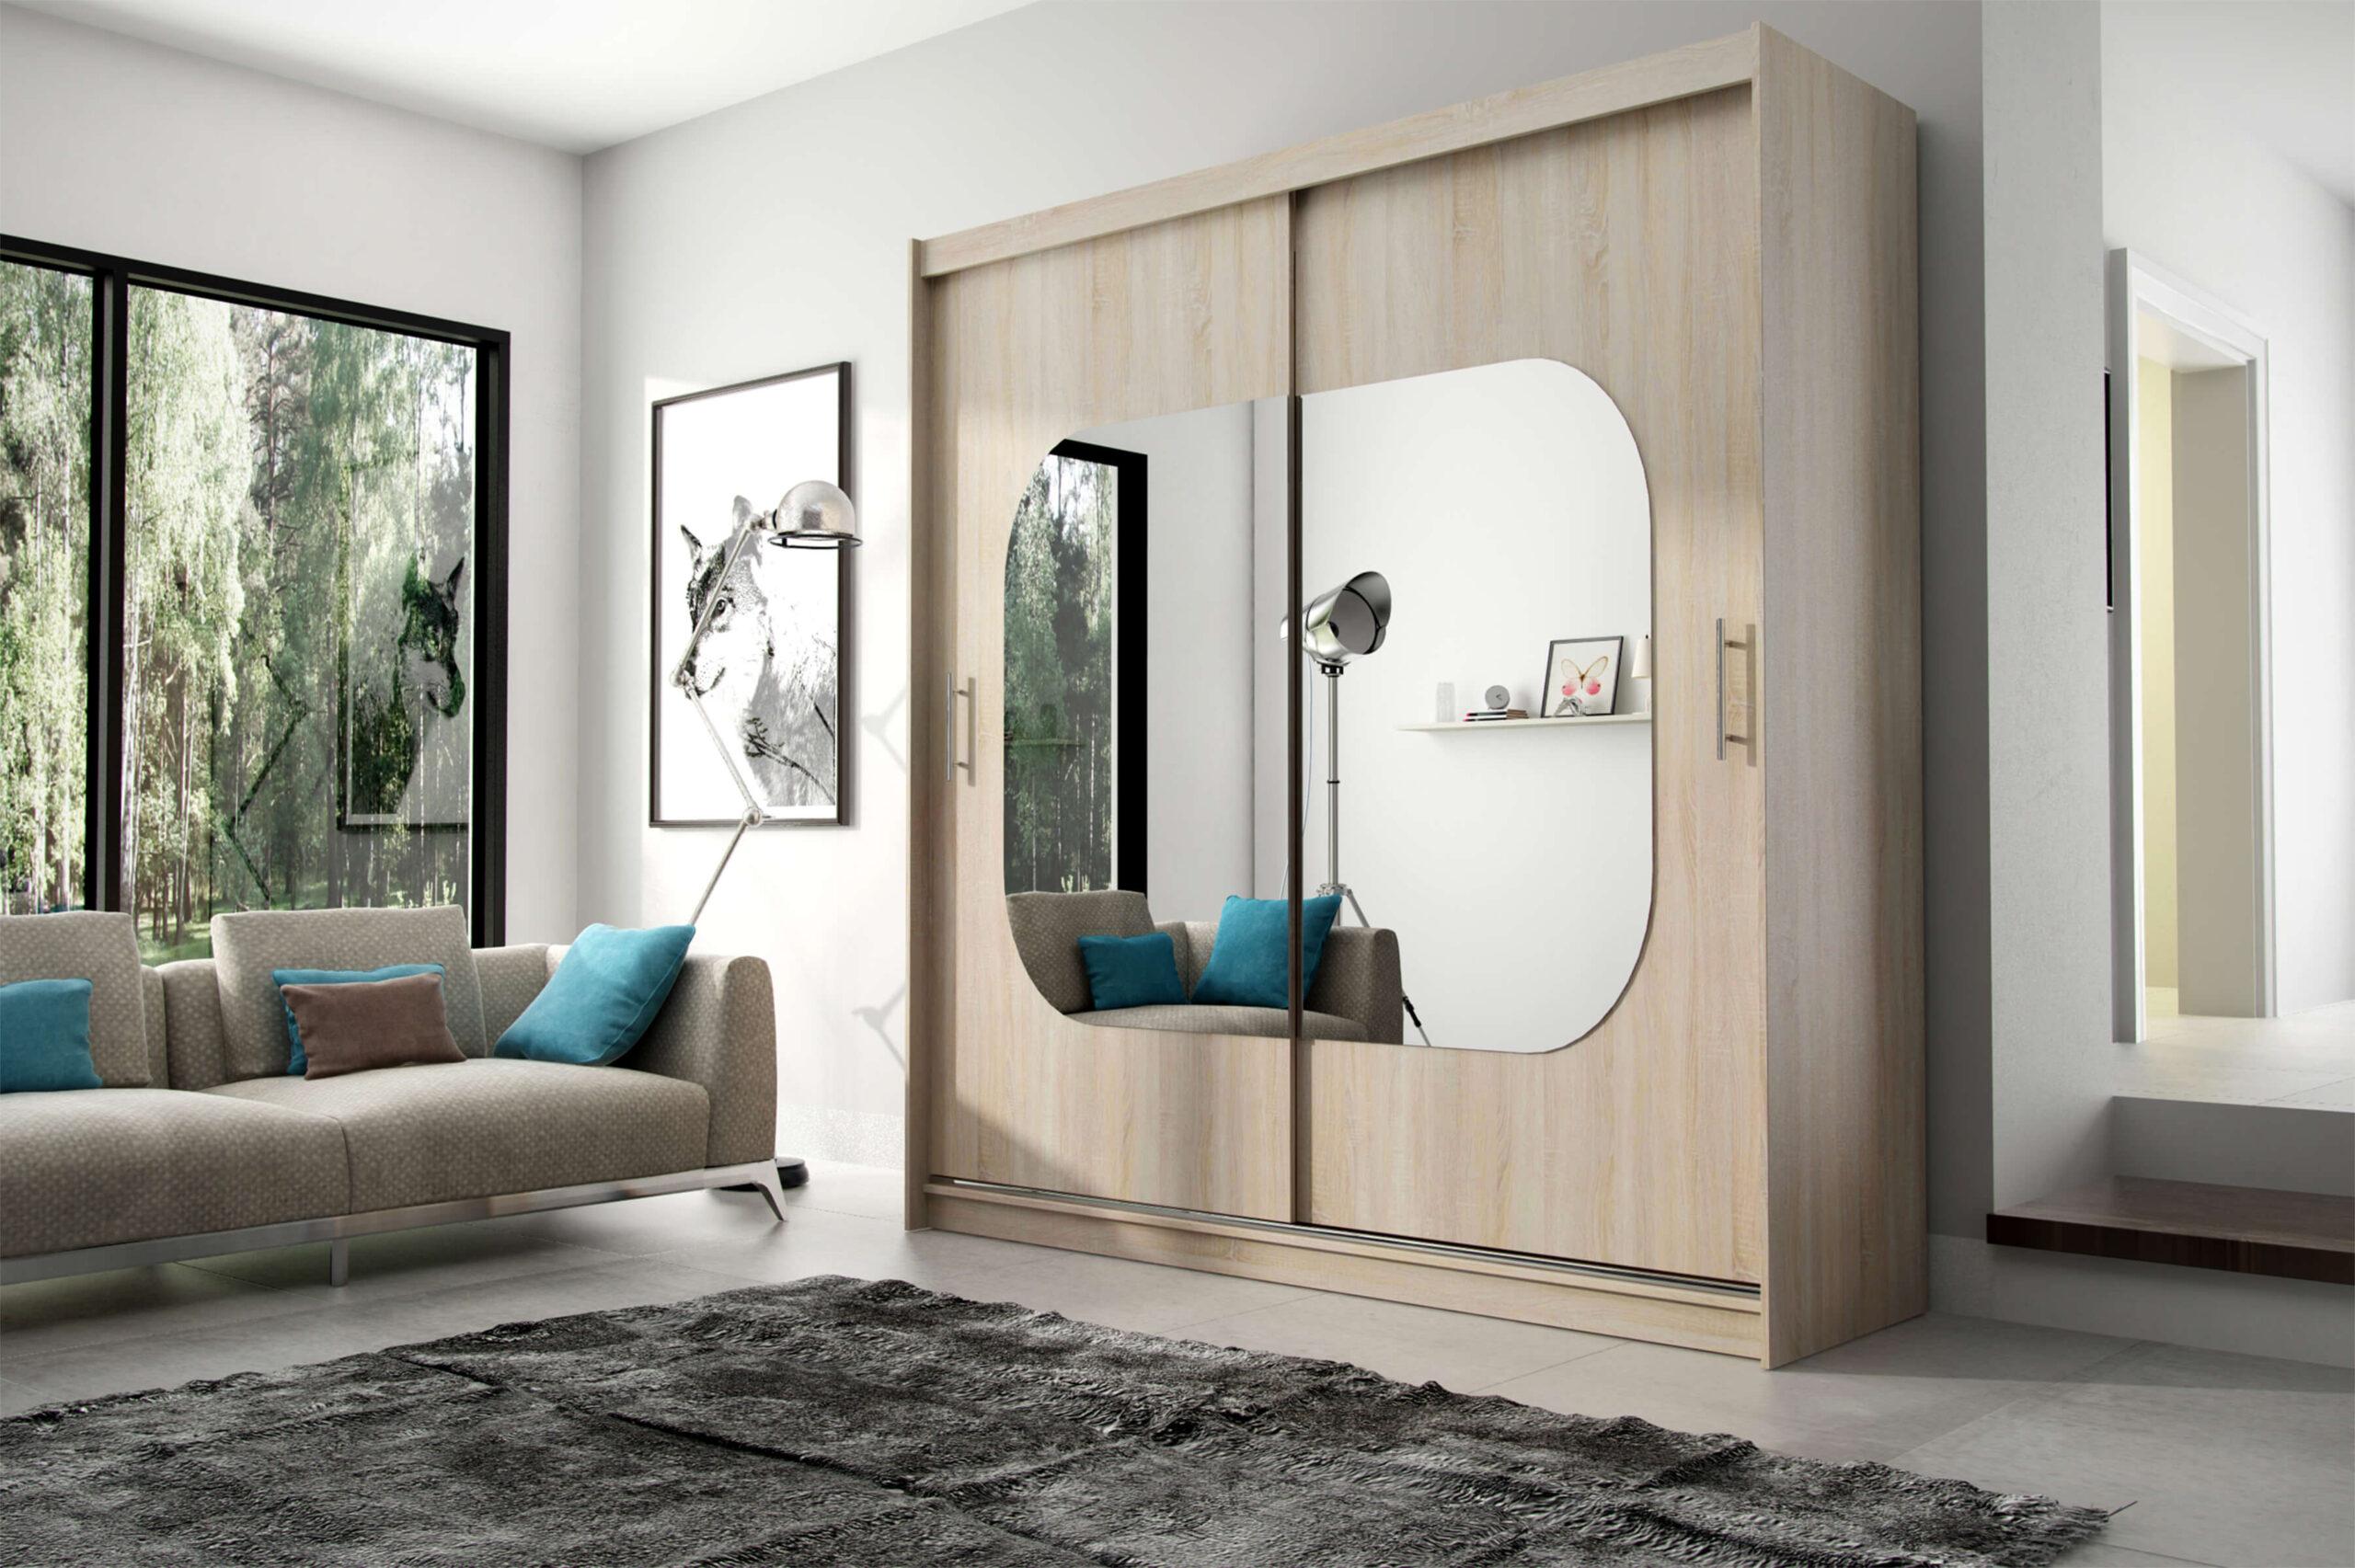 https://www.excluzive.se/wp-content/uploads/2020/11/Kola-07-180-cm-Garderob-med-LED-belysning-Sonoma-scaled.jpg